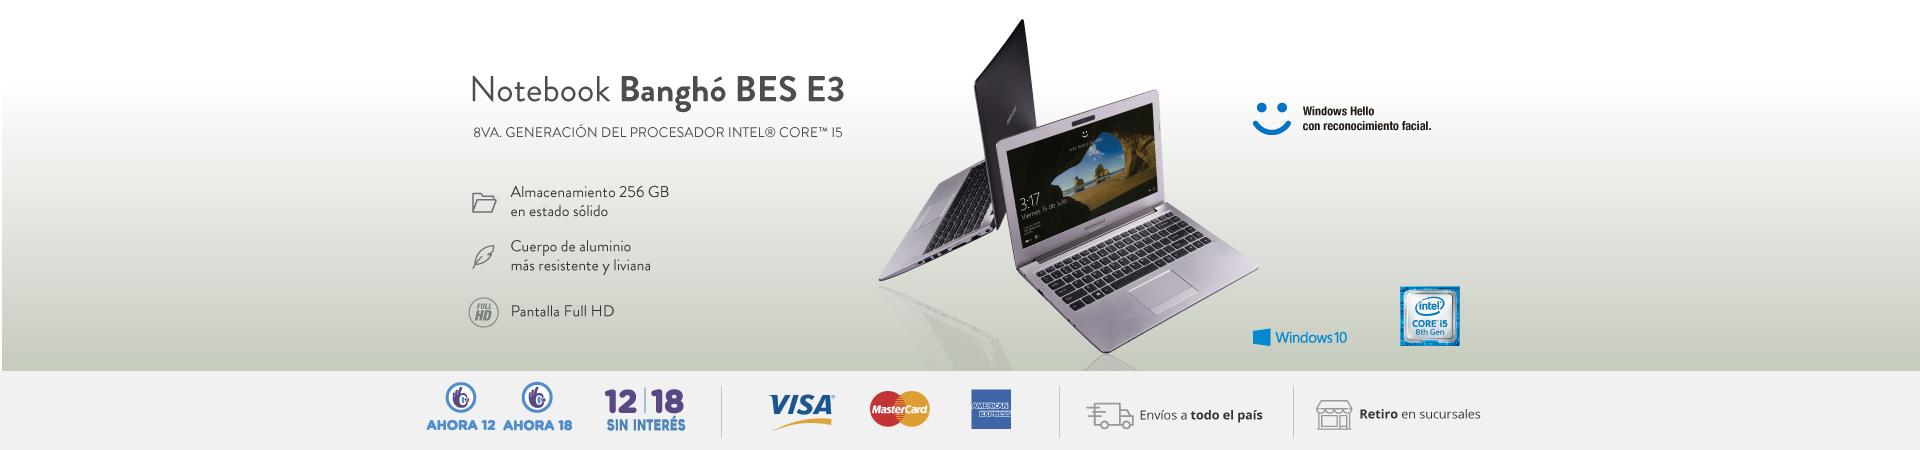 BES E3 - Jueves a Domingo